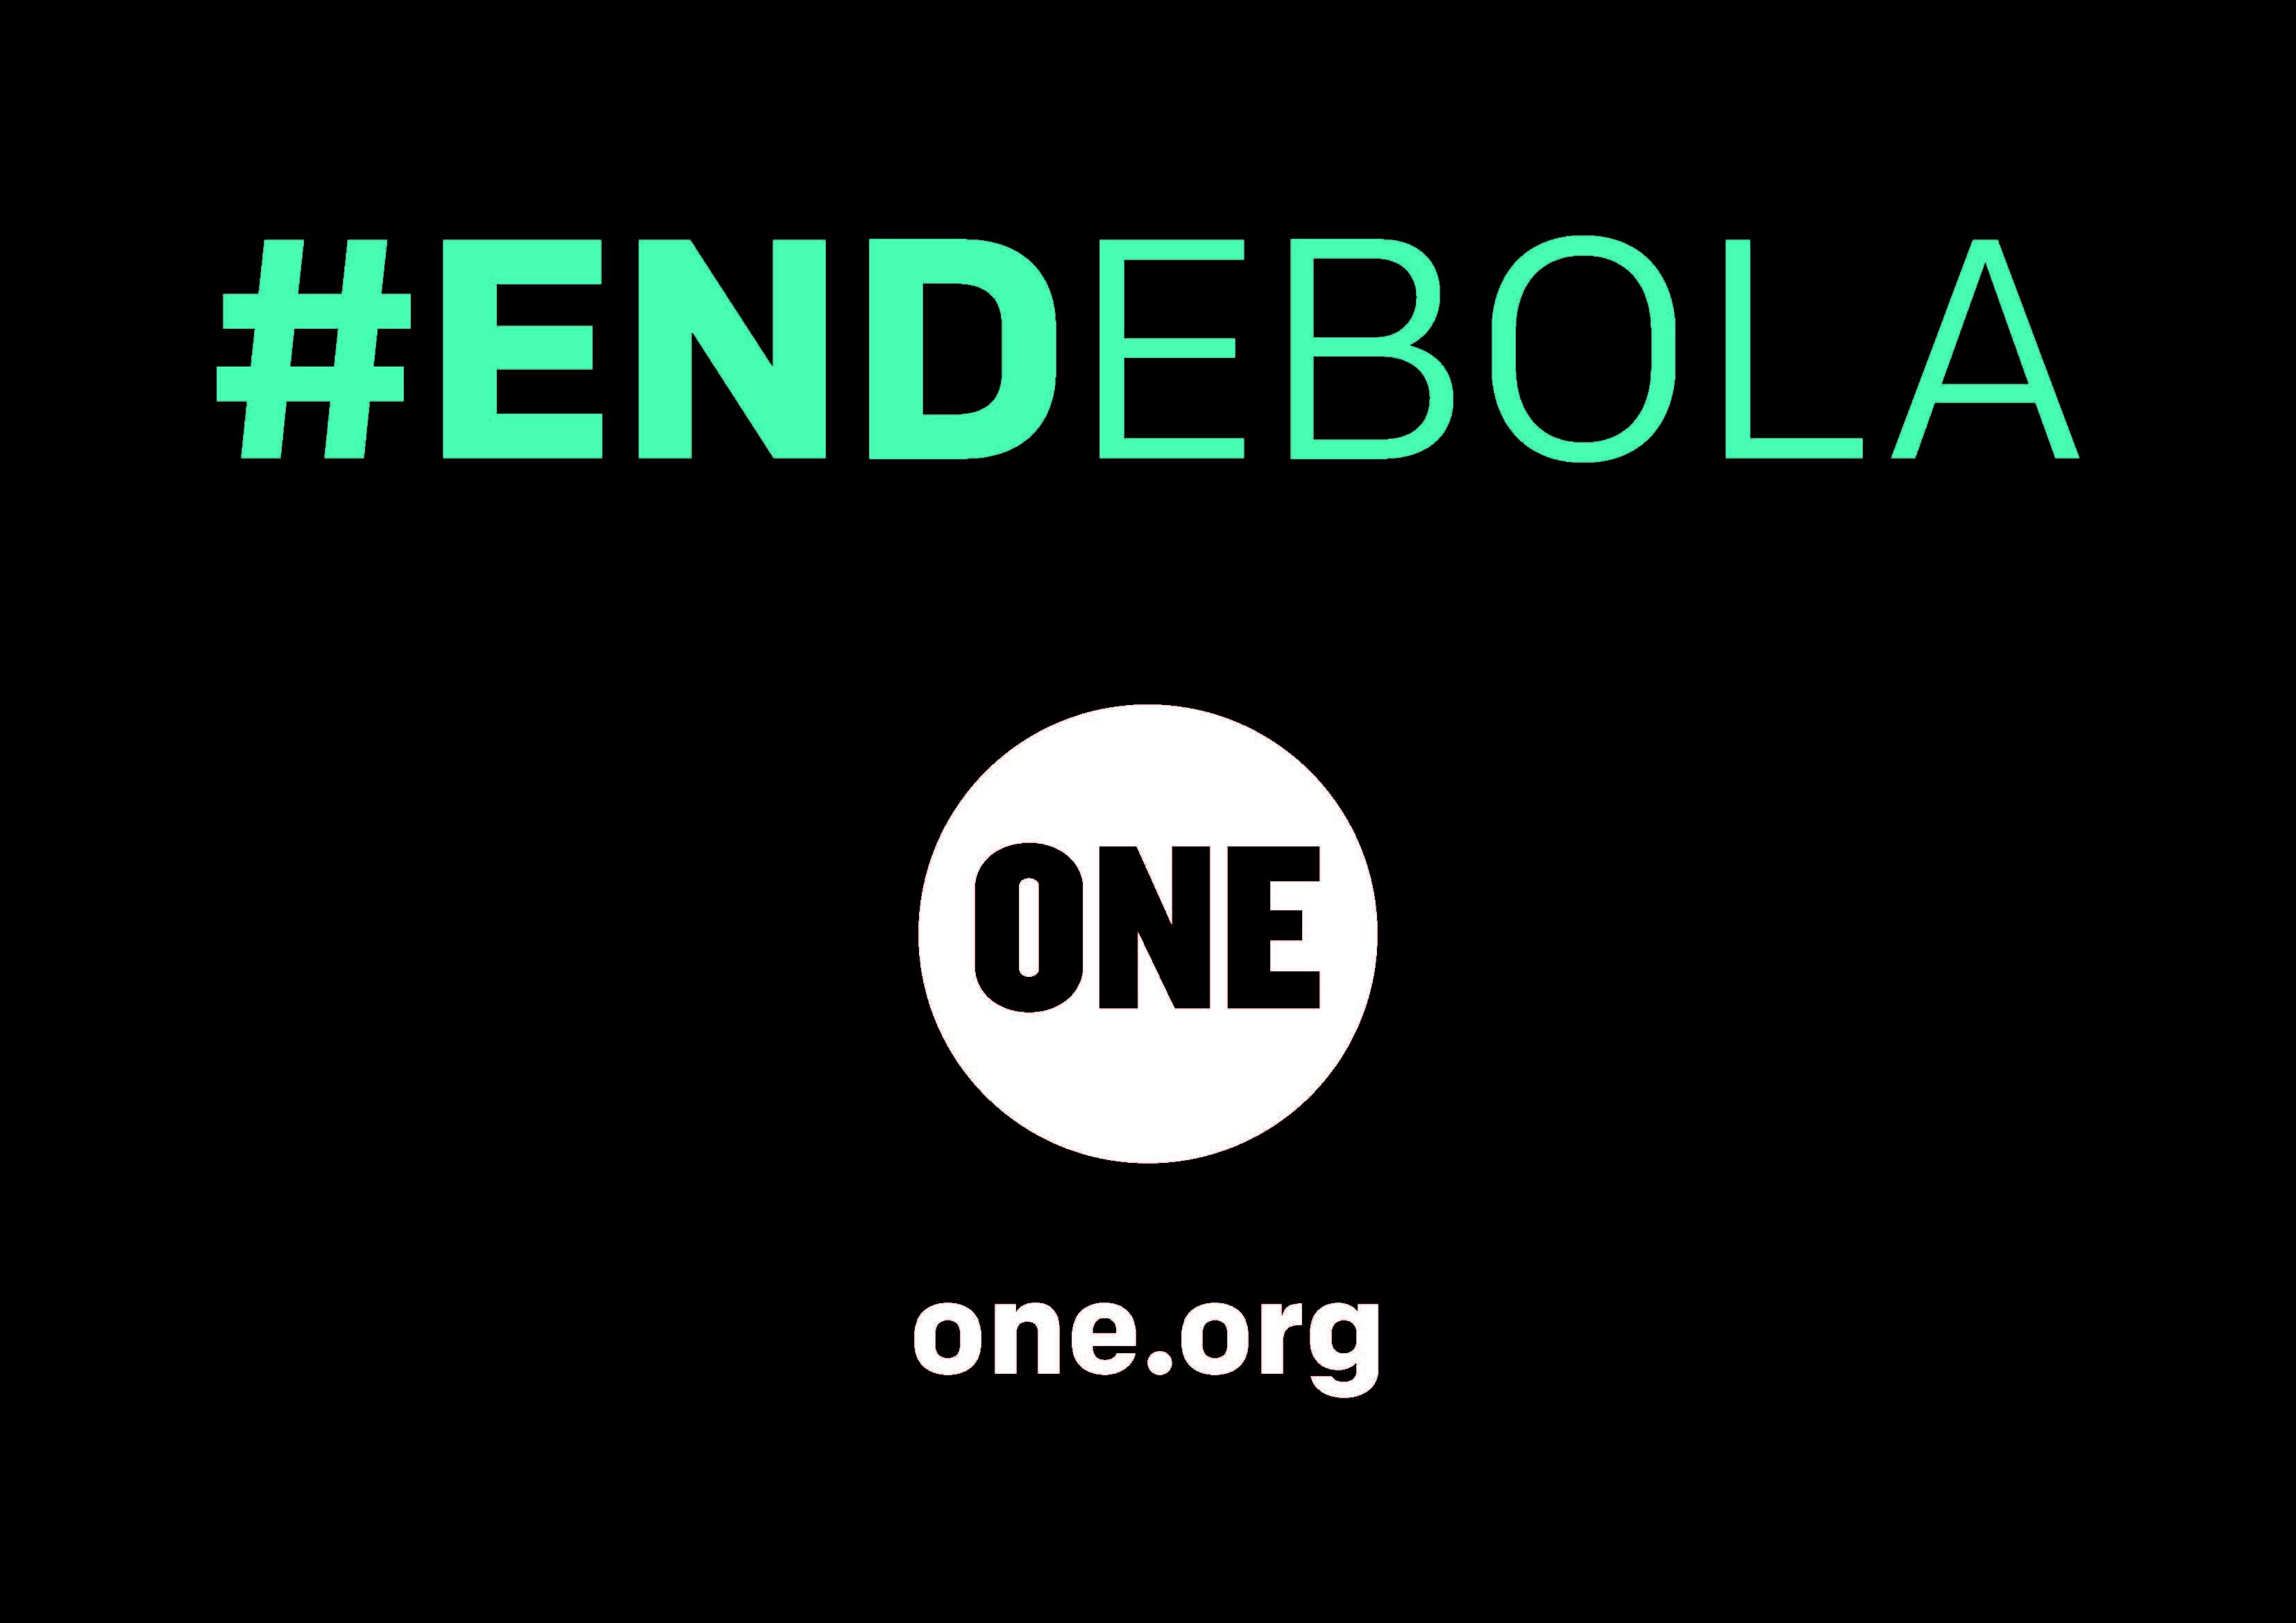 EBOLA: malgré la fin de l'épidémie au Libéria, restons vigilants